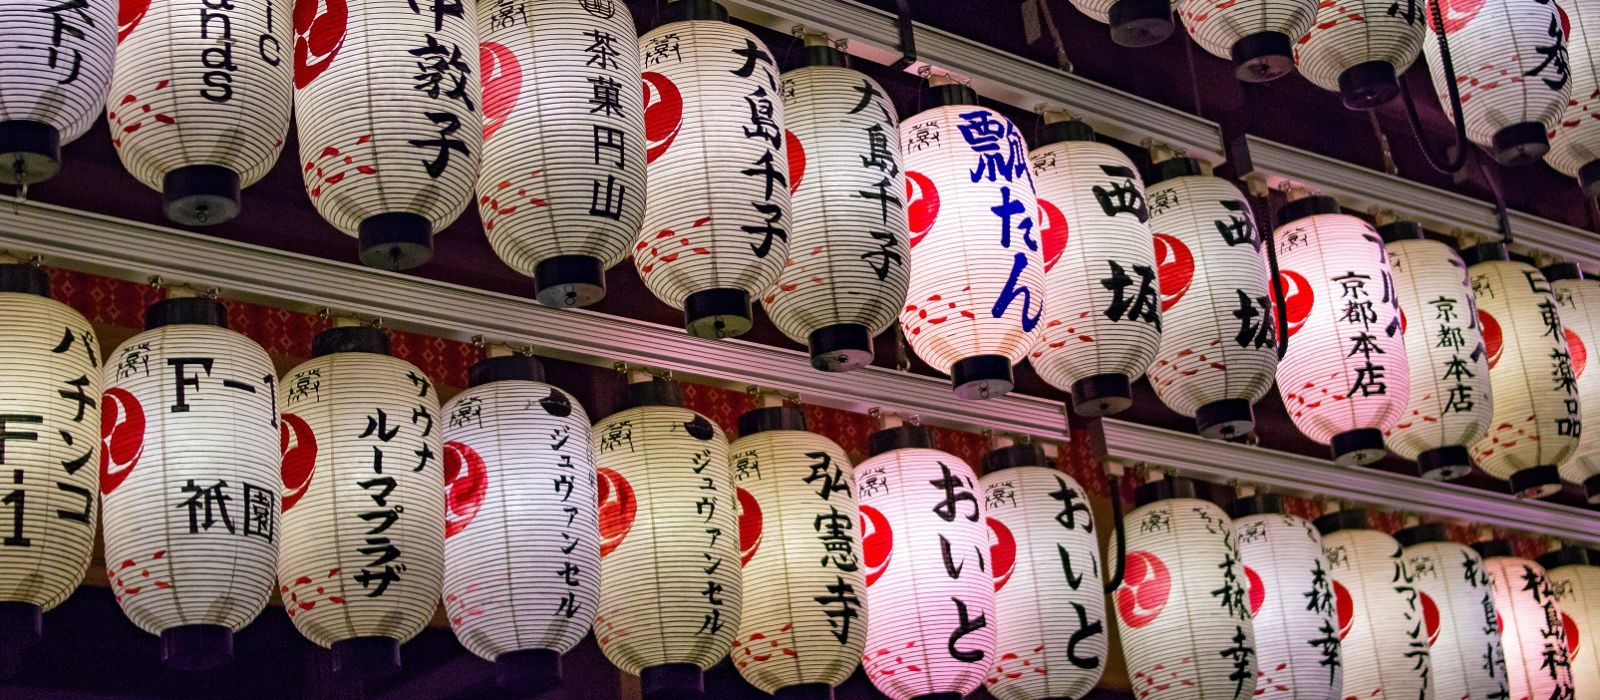 Culture & Heritage in Japan Tour Trip 4